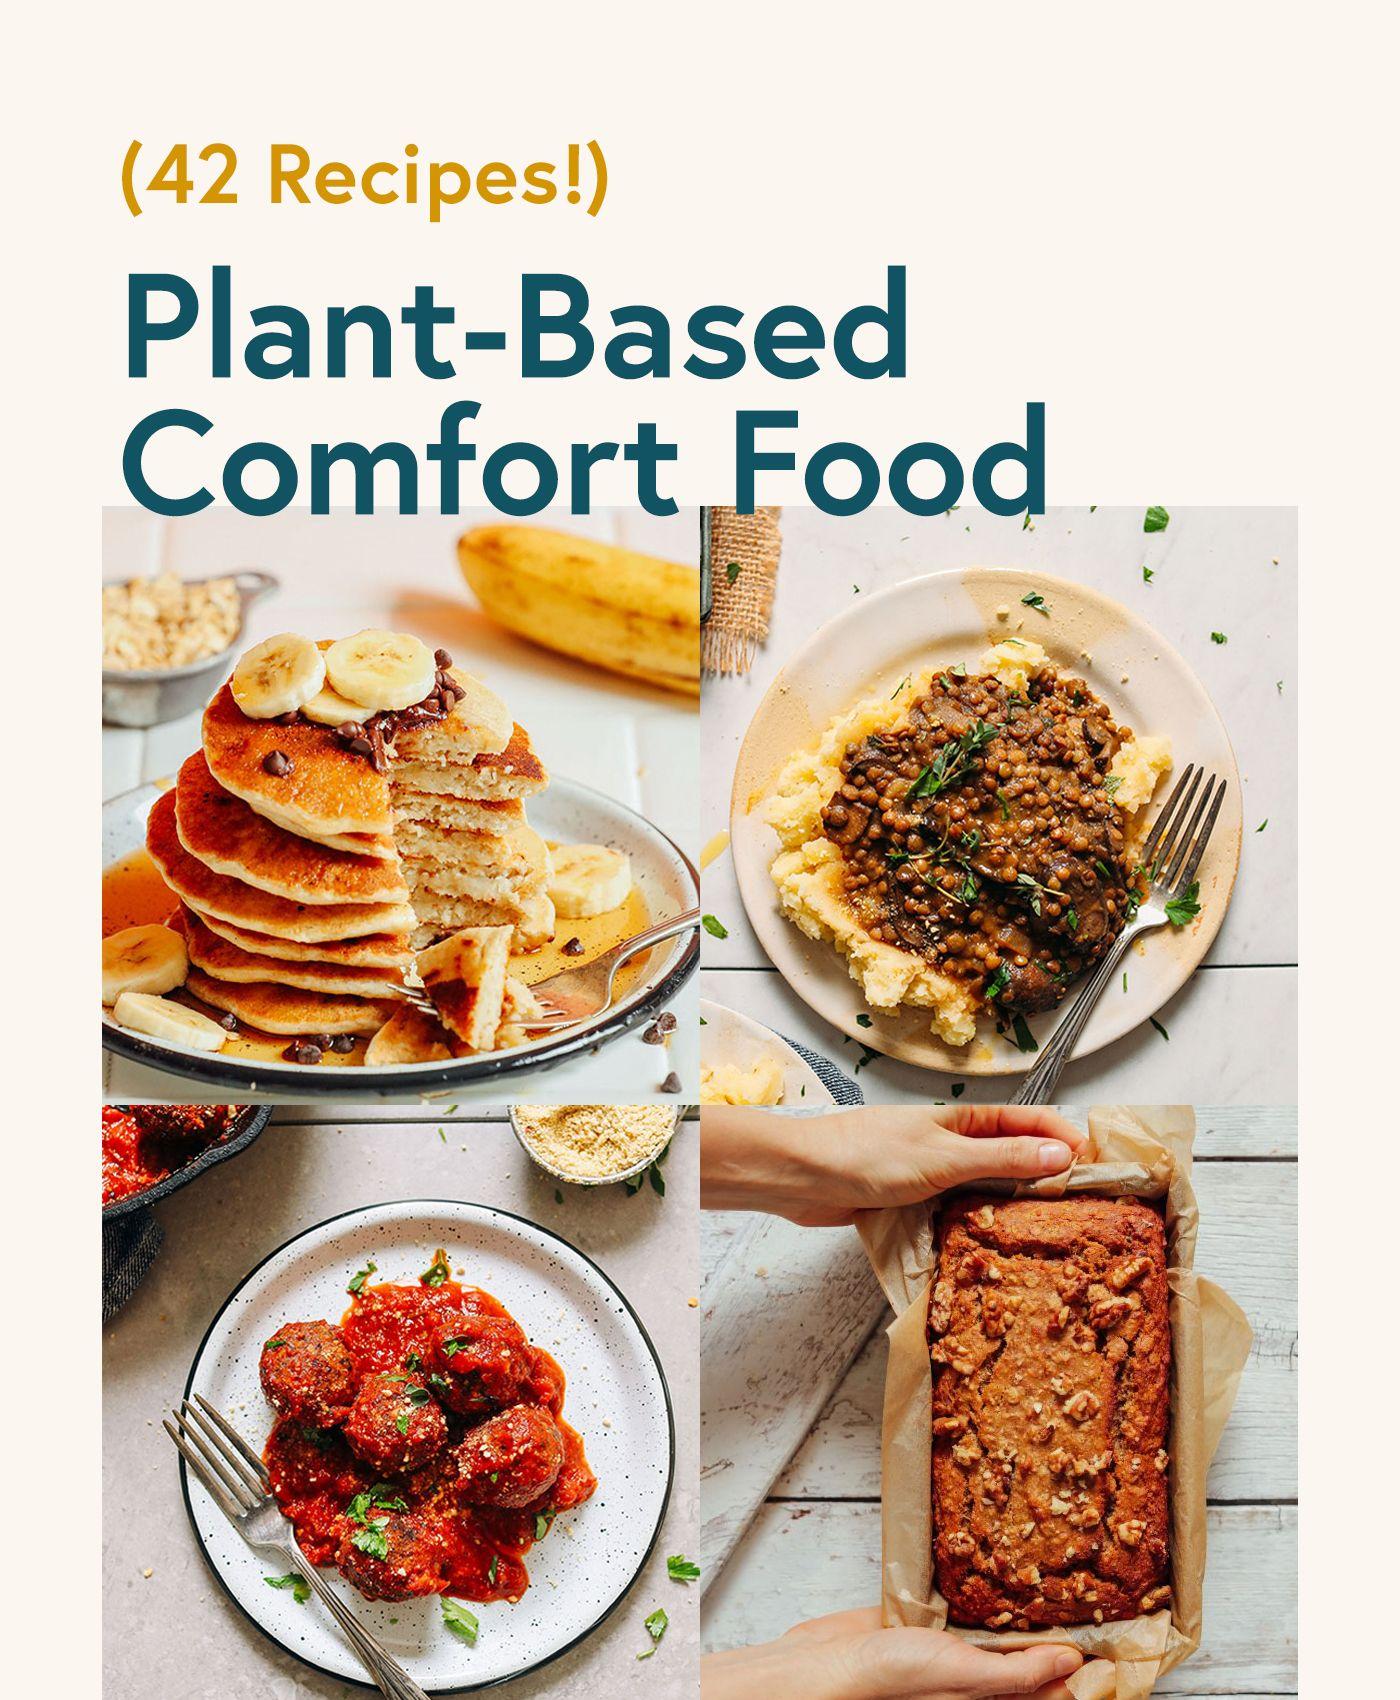 42 Plant-Based Comfort Food Recipes #minimalistbaker #recipes #comfortfood #roundup